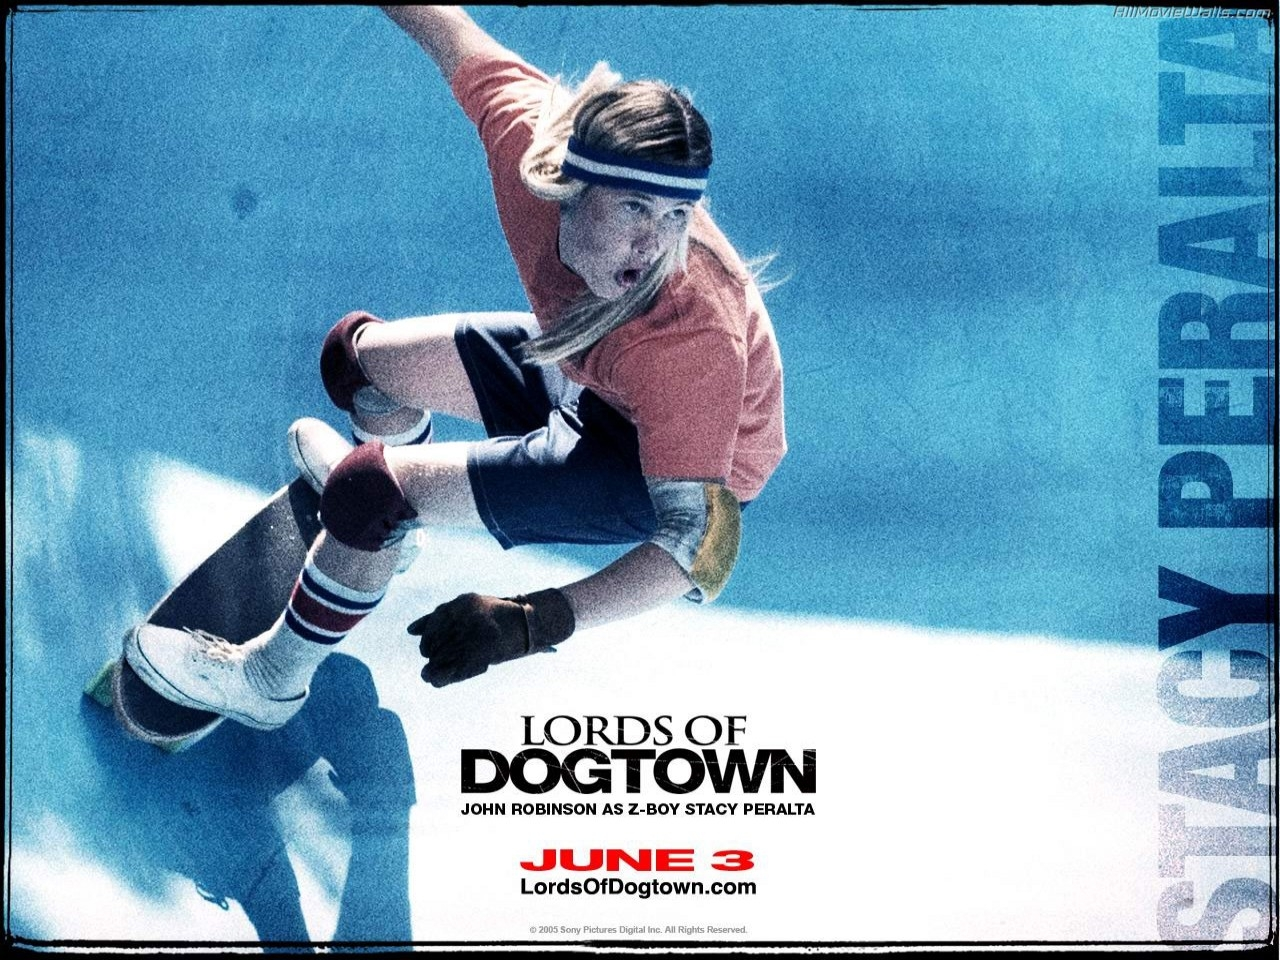 Wallpaper del film Lords of Dogtown del 2005